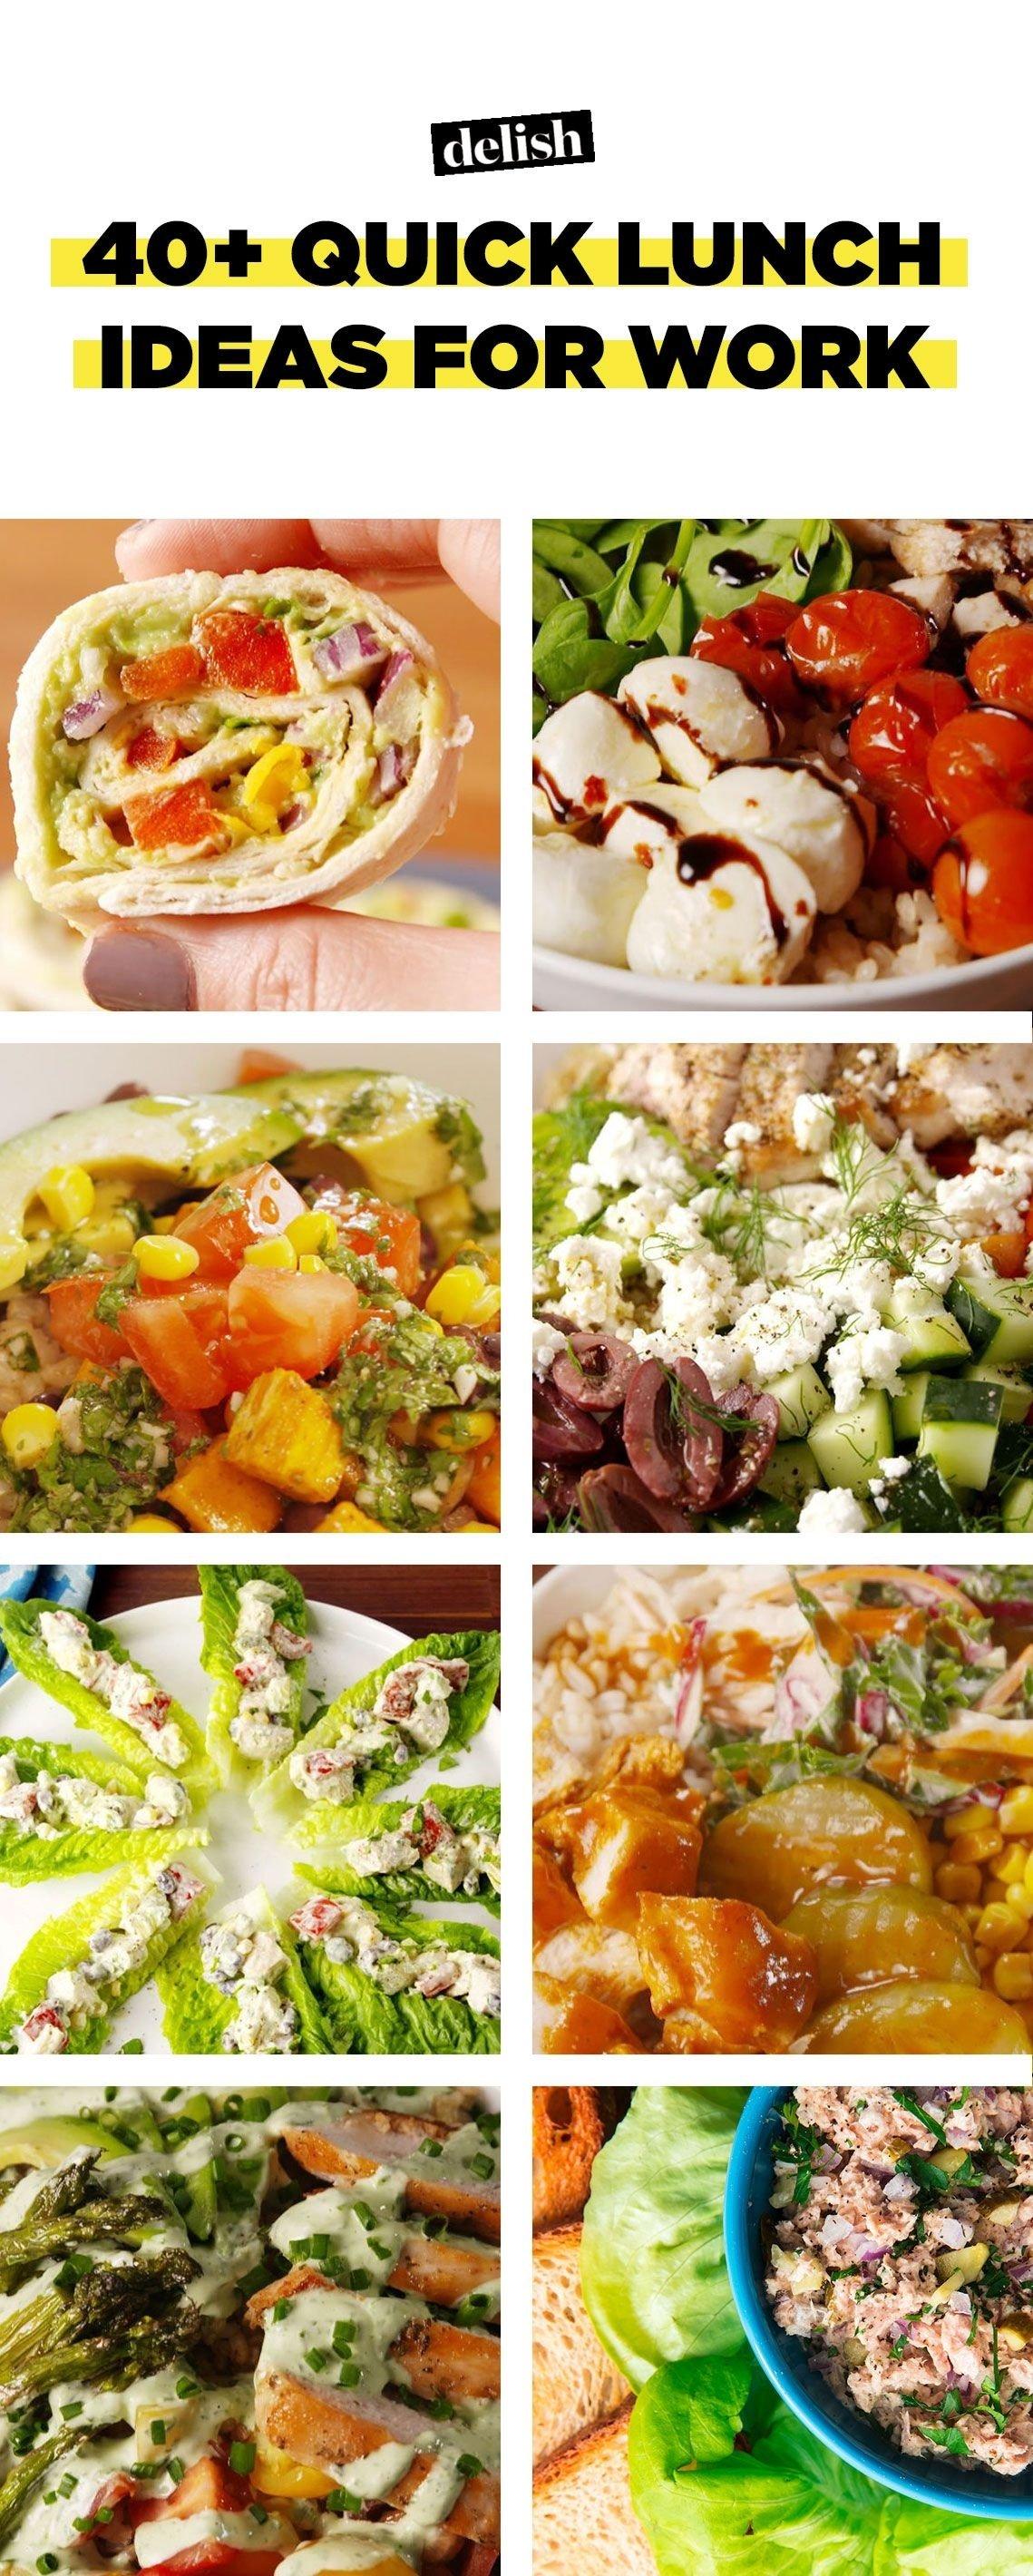 10 Elegant Diet Lunch Ideas For Work 40 quick lunch ideas for work recipes for fast work lunches 3 2020